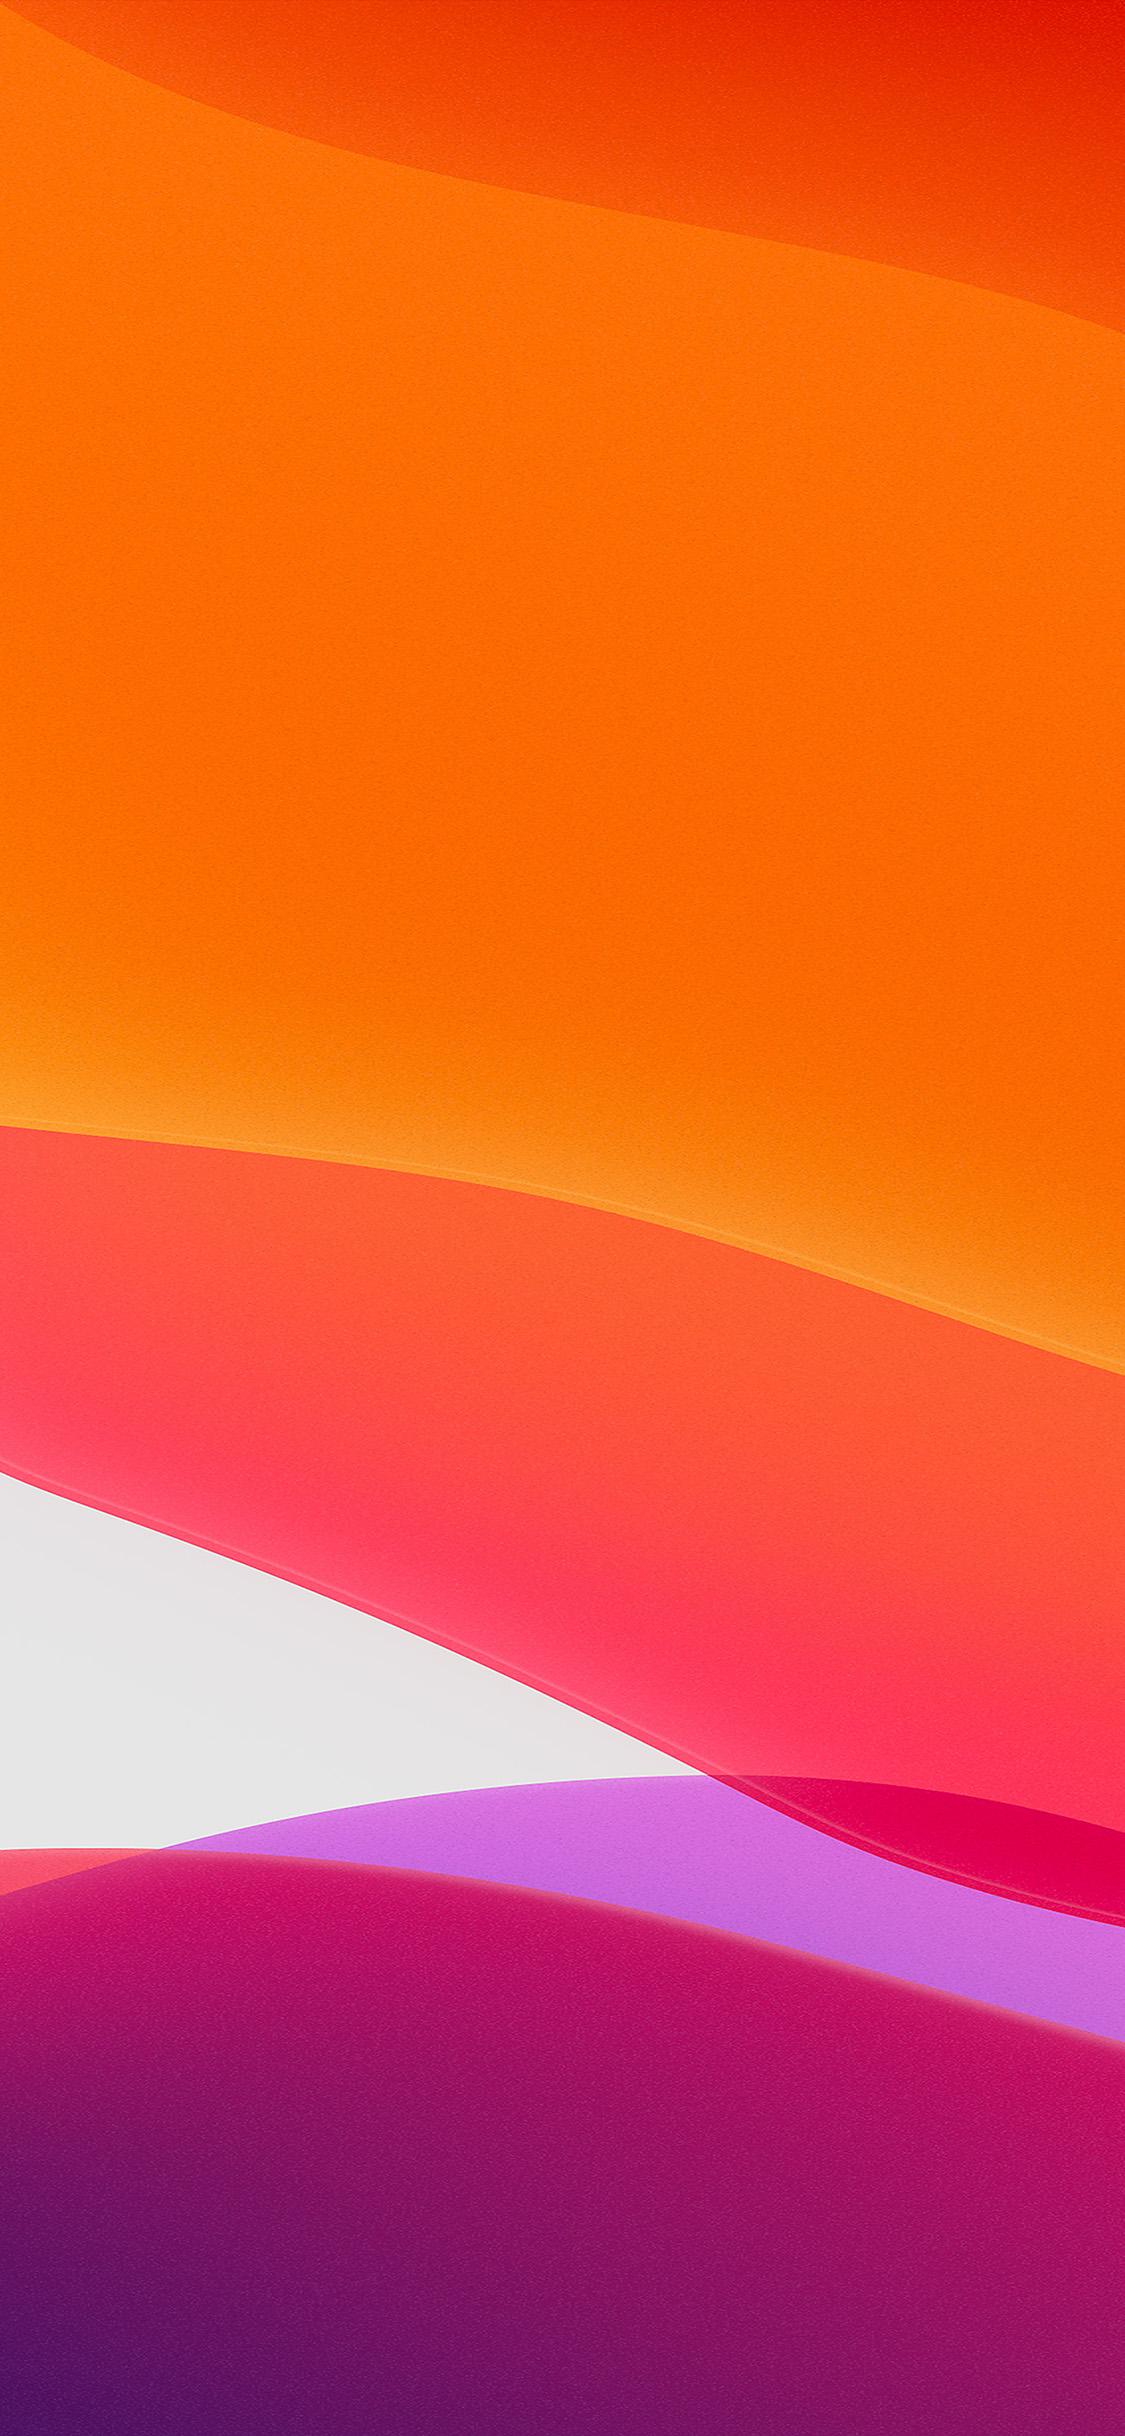 iPhonexpapers.com-Apple-iPhone-wallpaper-bj42-apple-iphone-ios13-background-orange-art